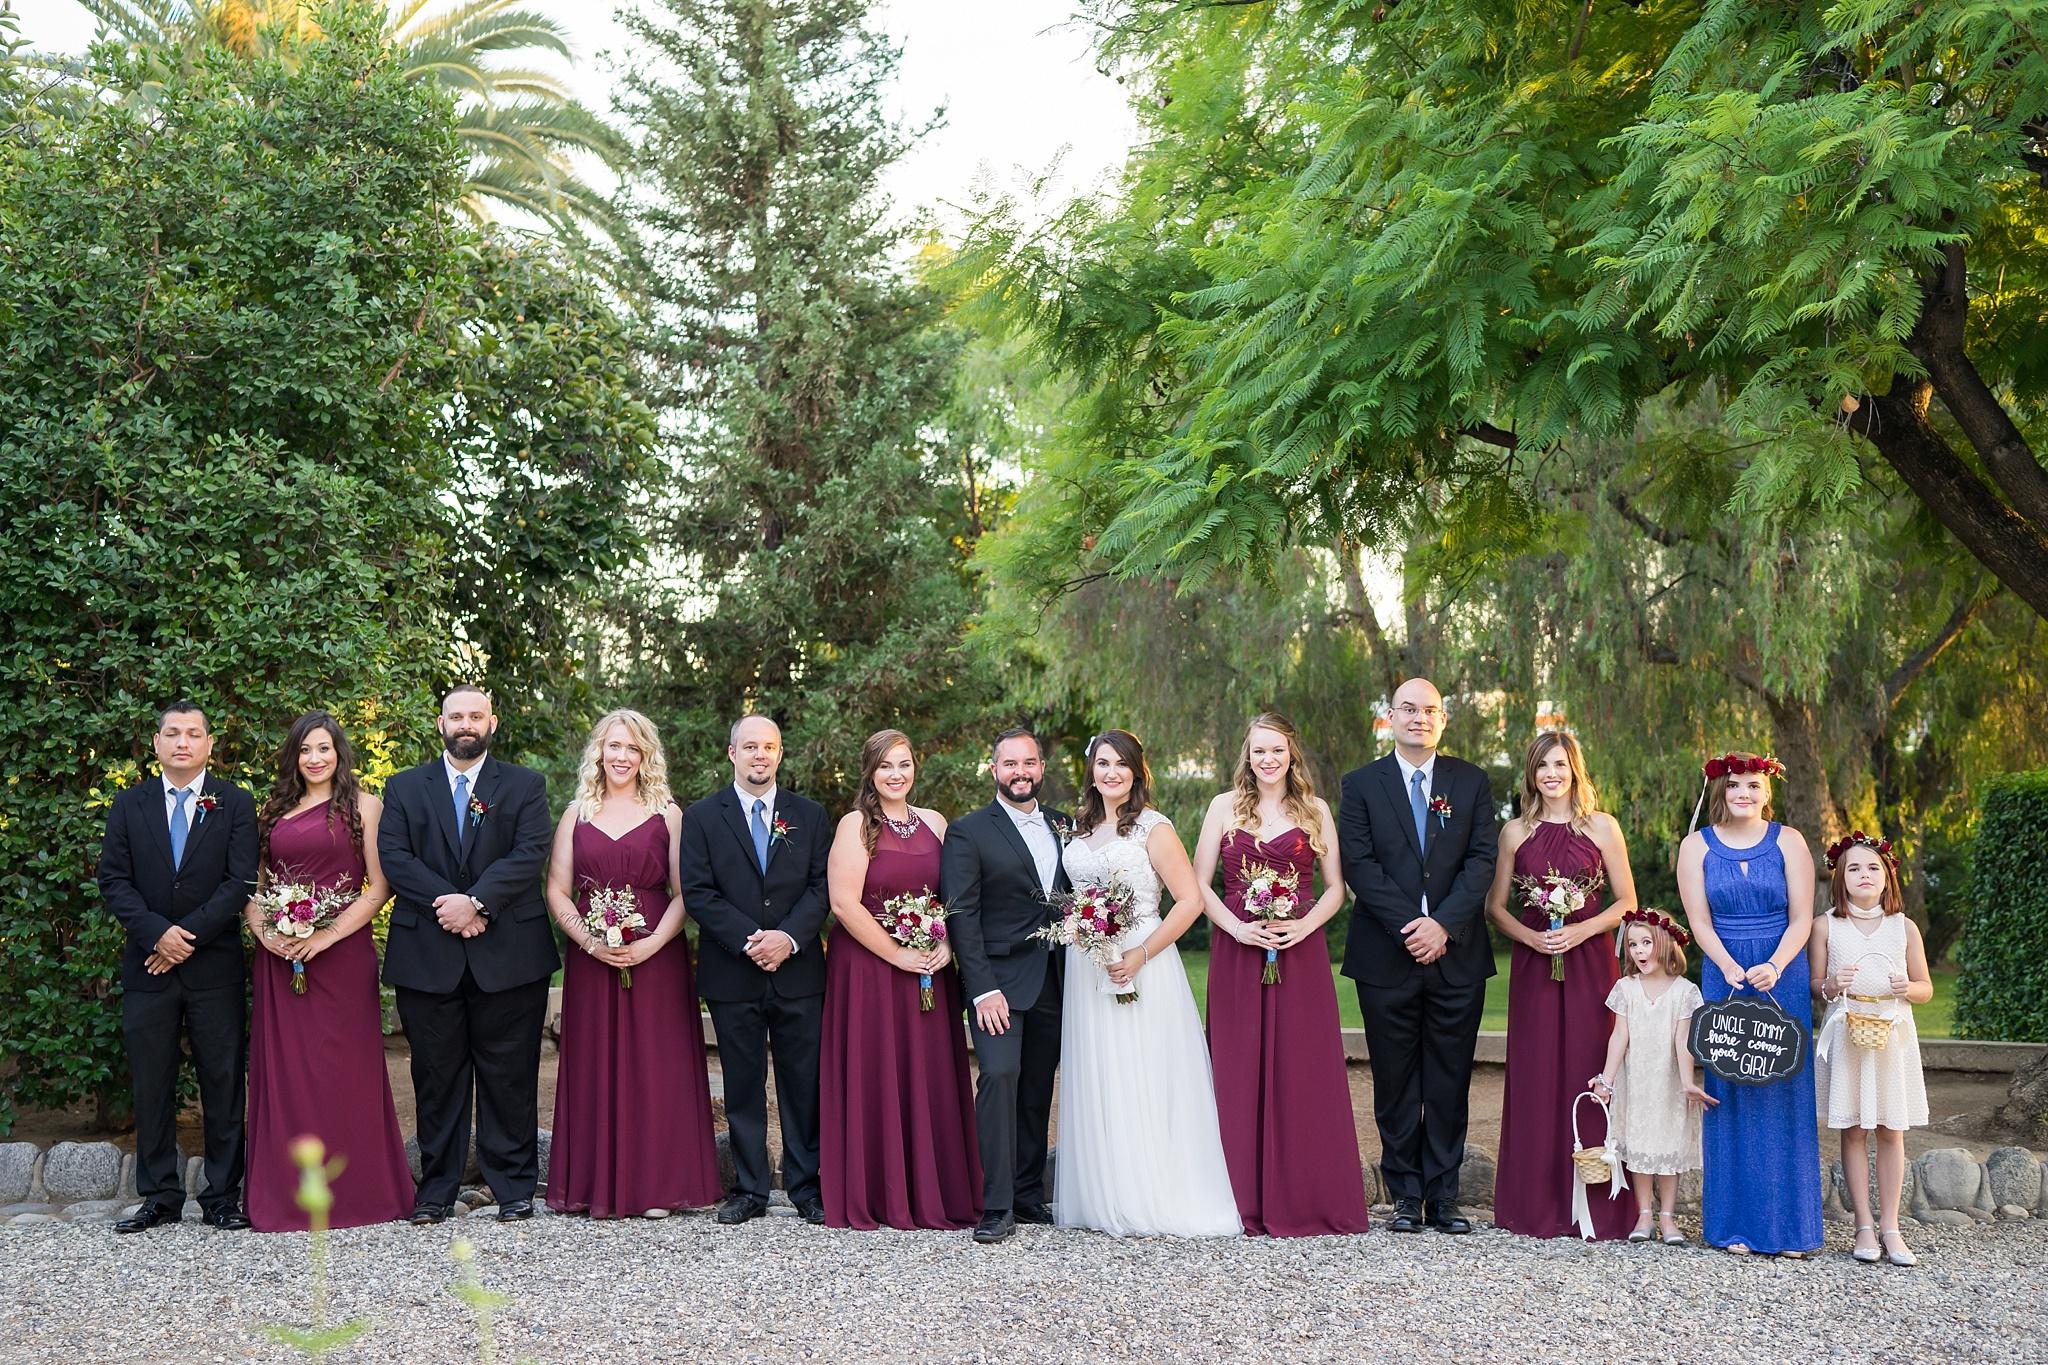 TommyandAmanda_WEDDING_BrienneMichelle_WeddingParty_01_BLOG.jpg